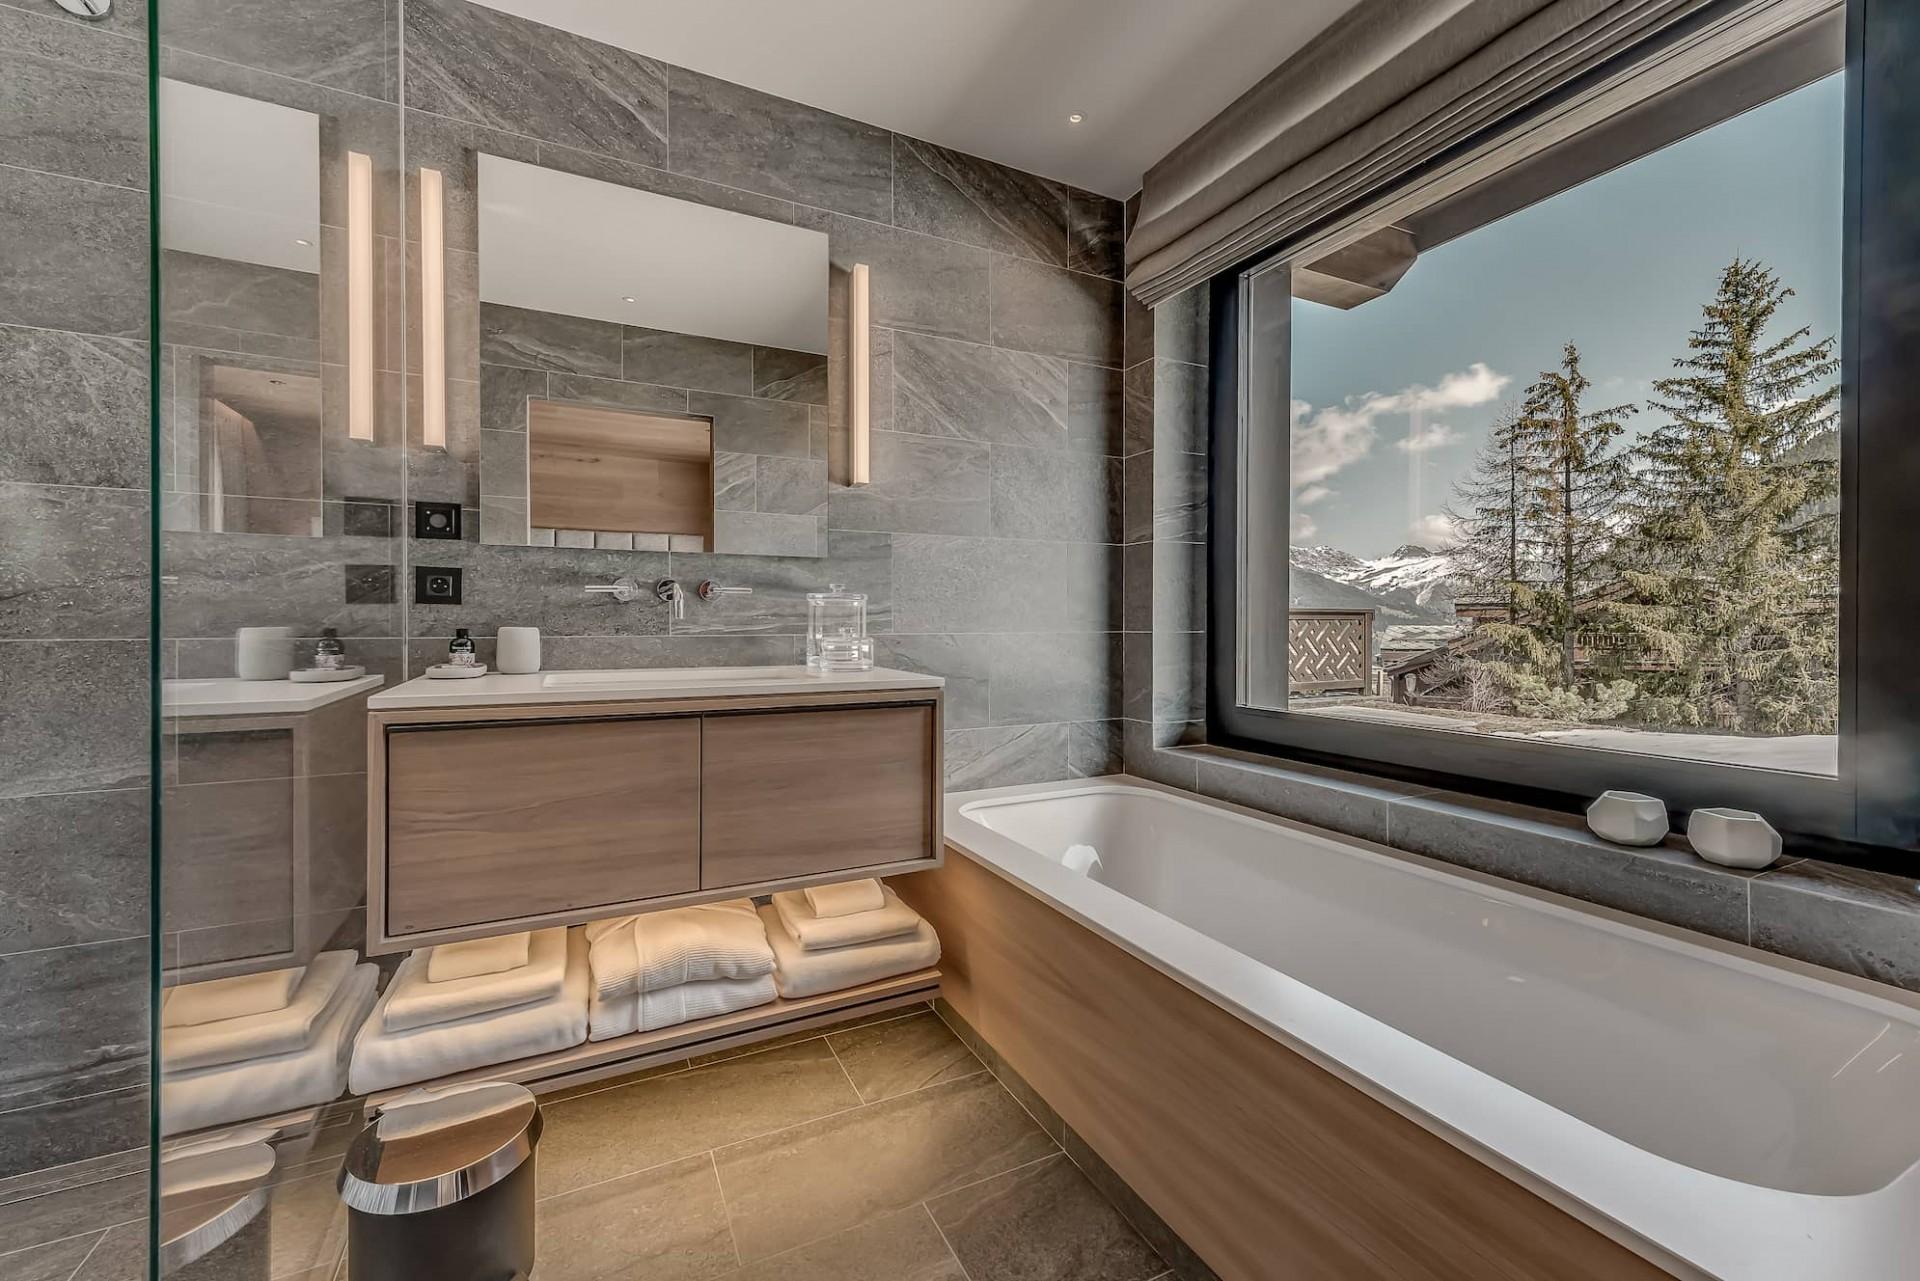 Courchevel 1650 Luxury Rental Chalet Elana Bathroom 5